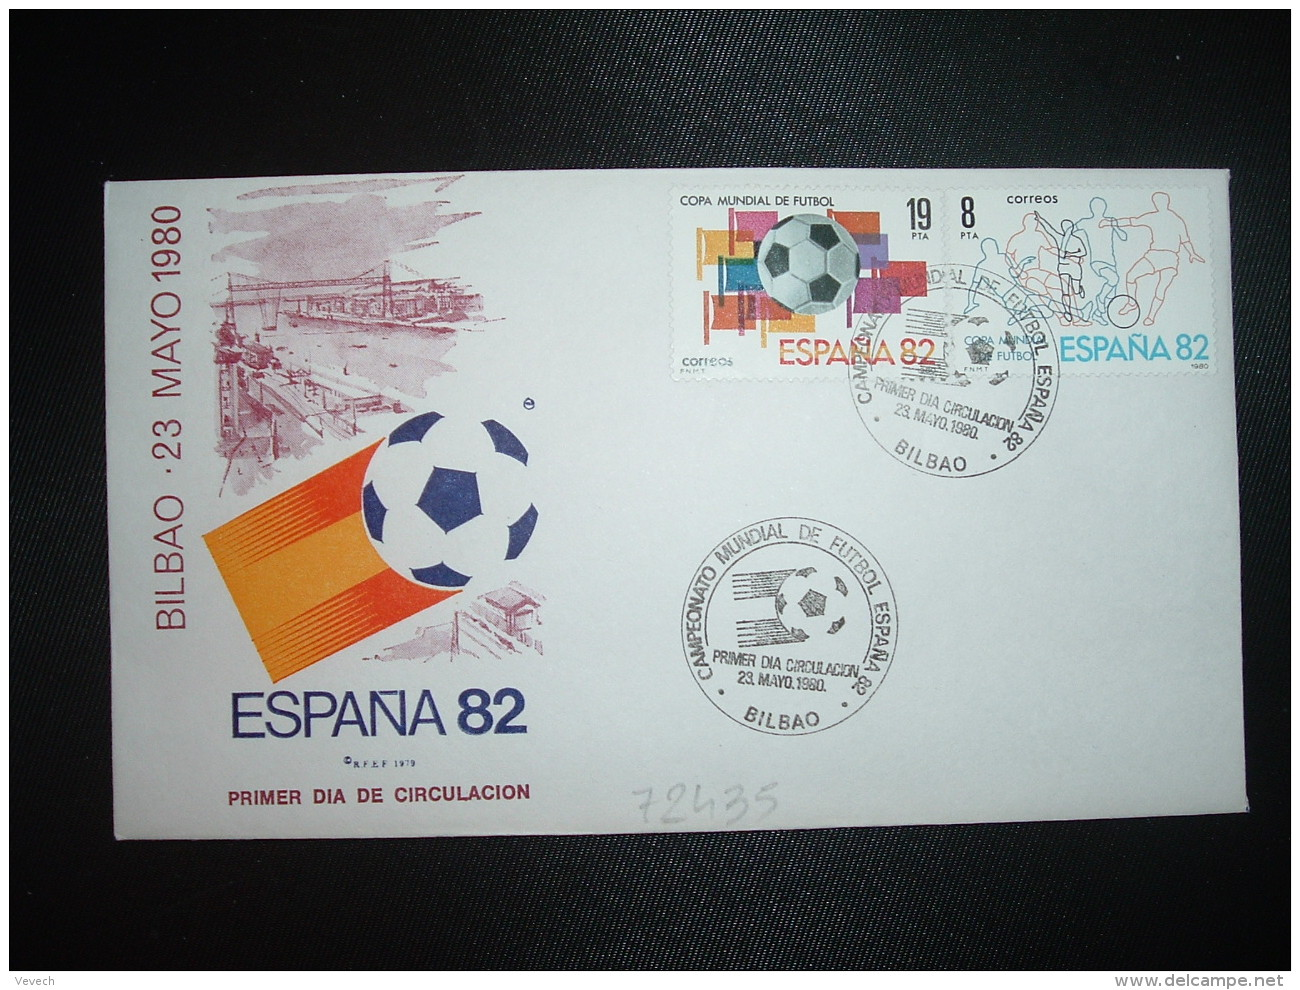 LETTRE TP ESPAGNE 19P + 8P OBL.23 MAYO 1980 FDC BILBAO CAMPEONATO MONDIAL DE FUTBOL ESPANA 82 - Fußball-Weltmeisterschaft